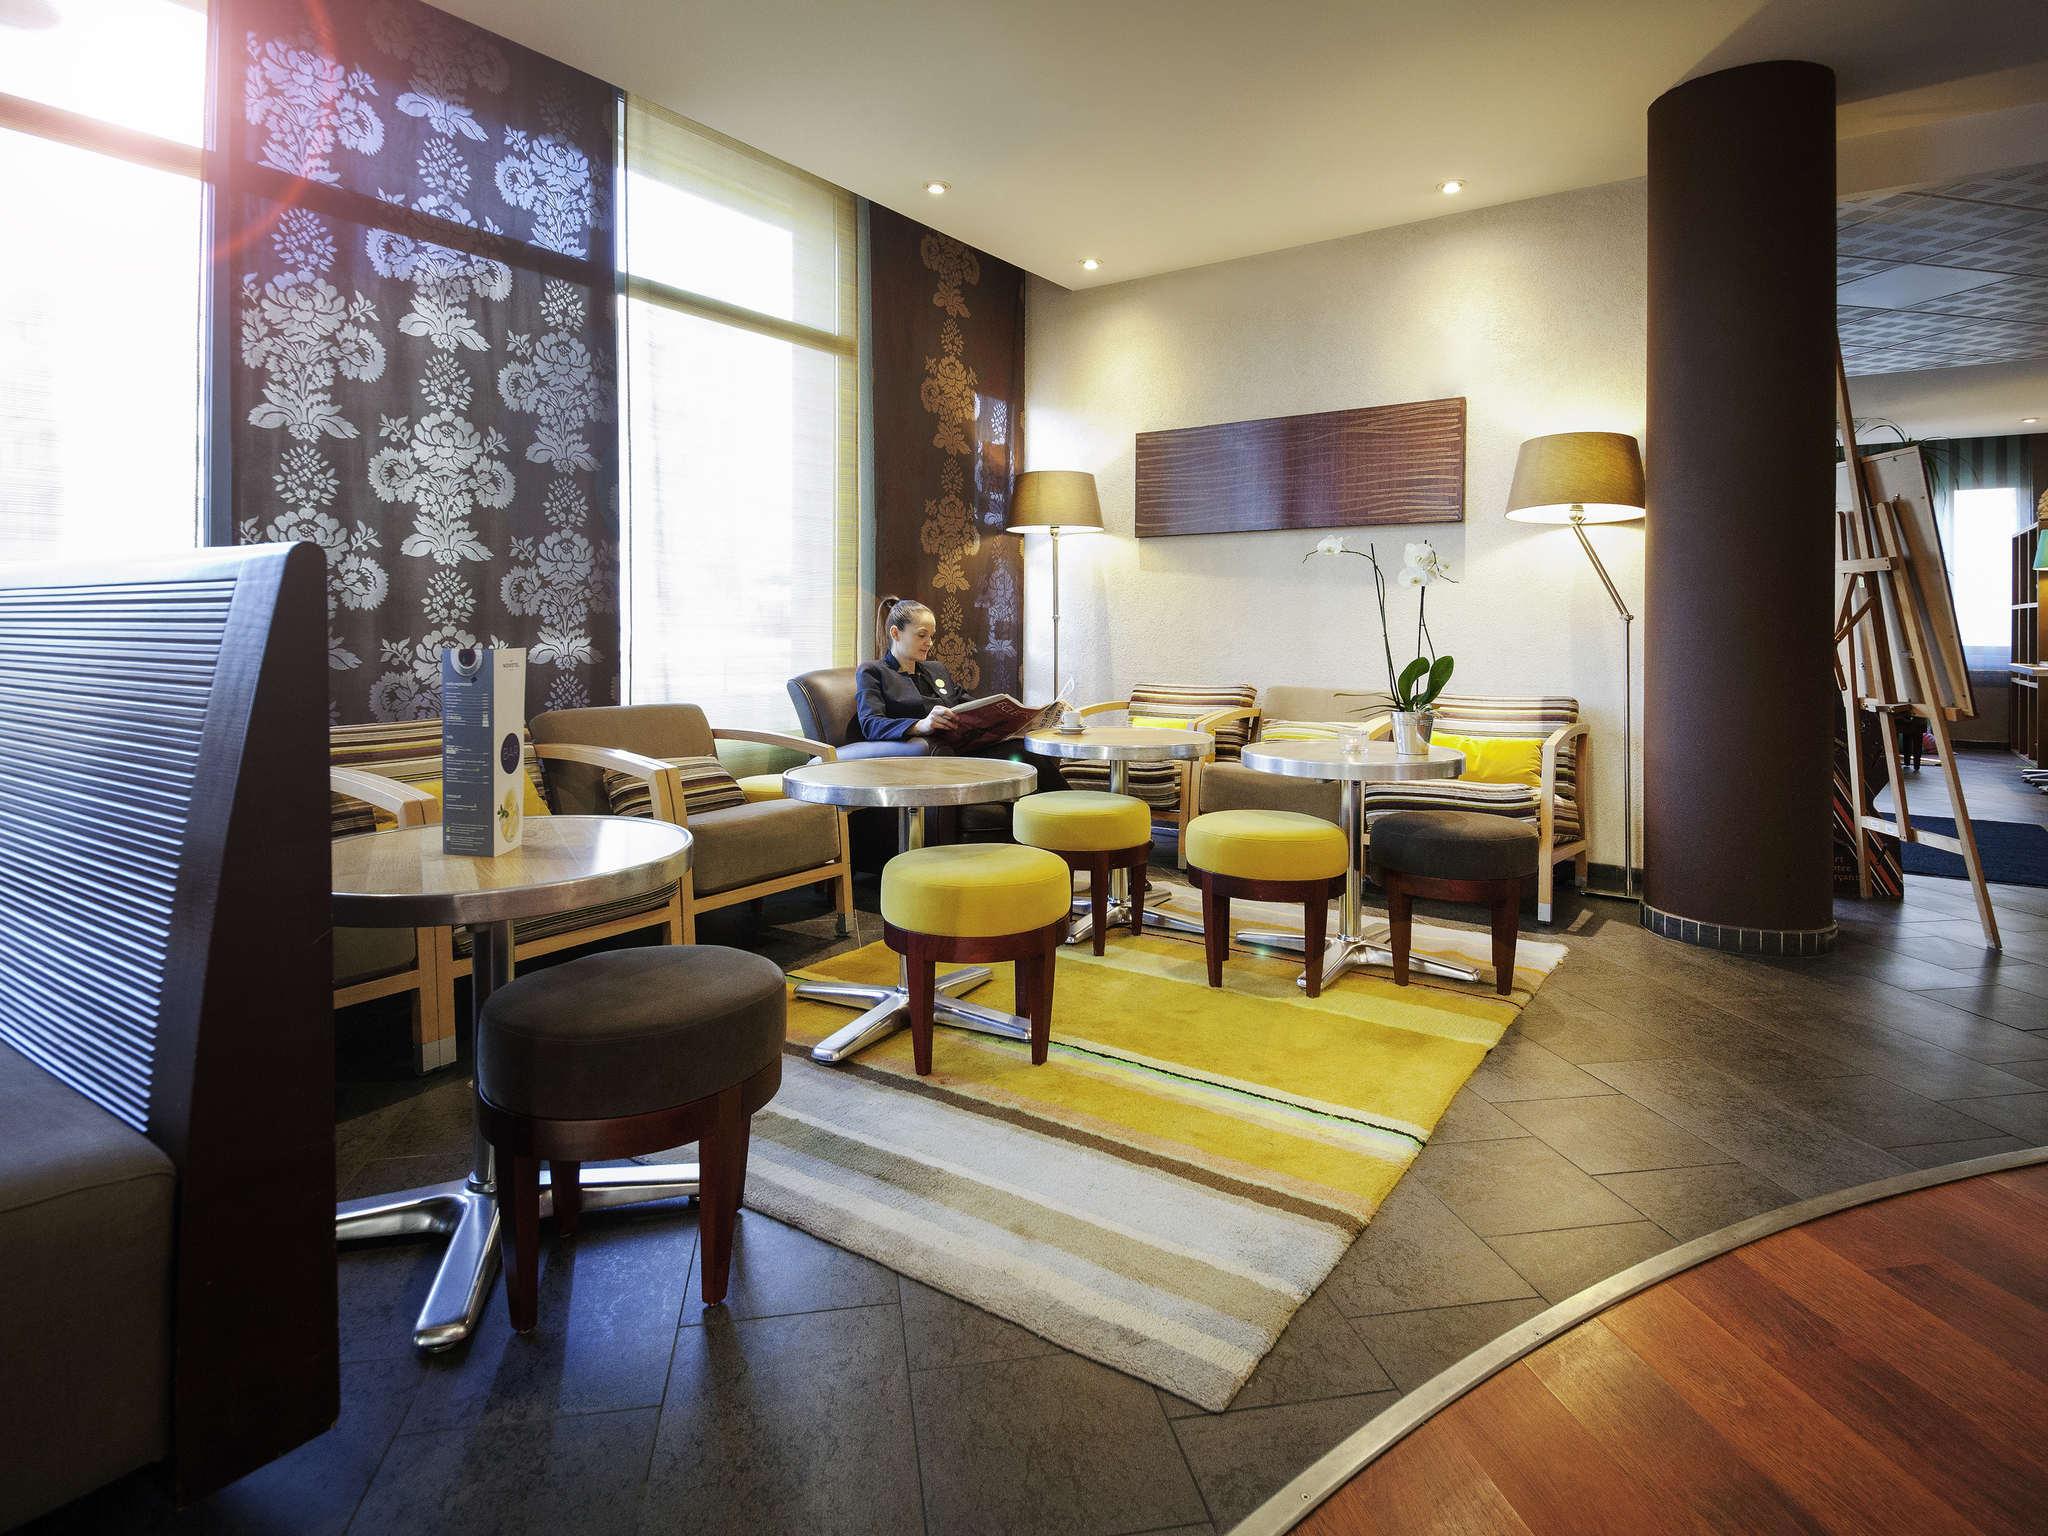 Hotel – Novotel Suites Clermont Ferrand Polydome